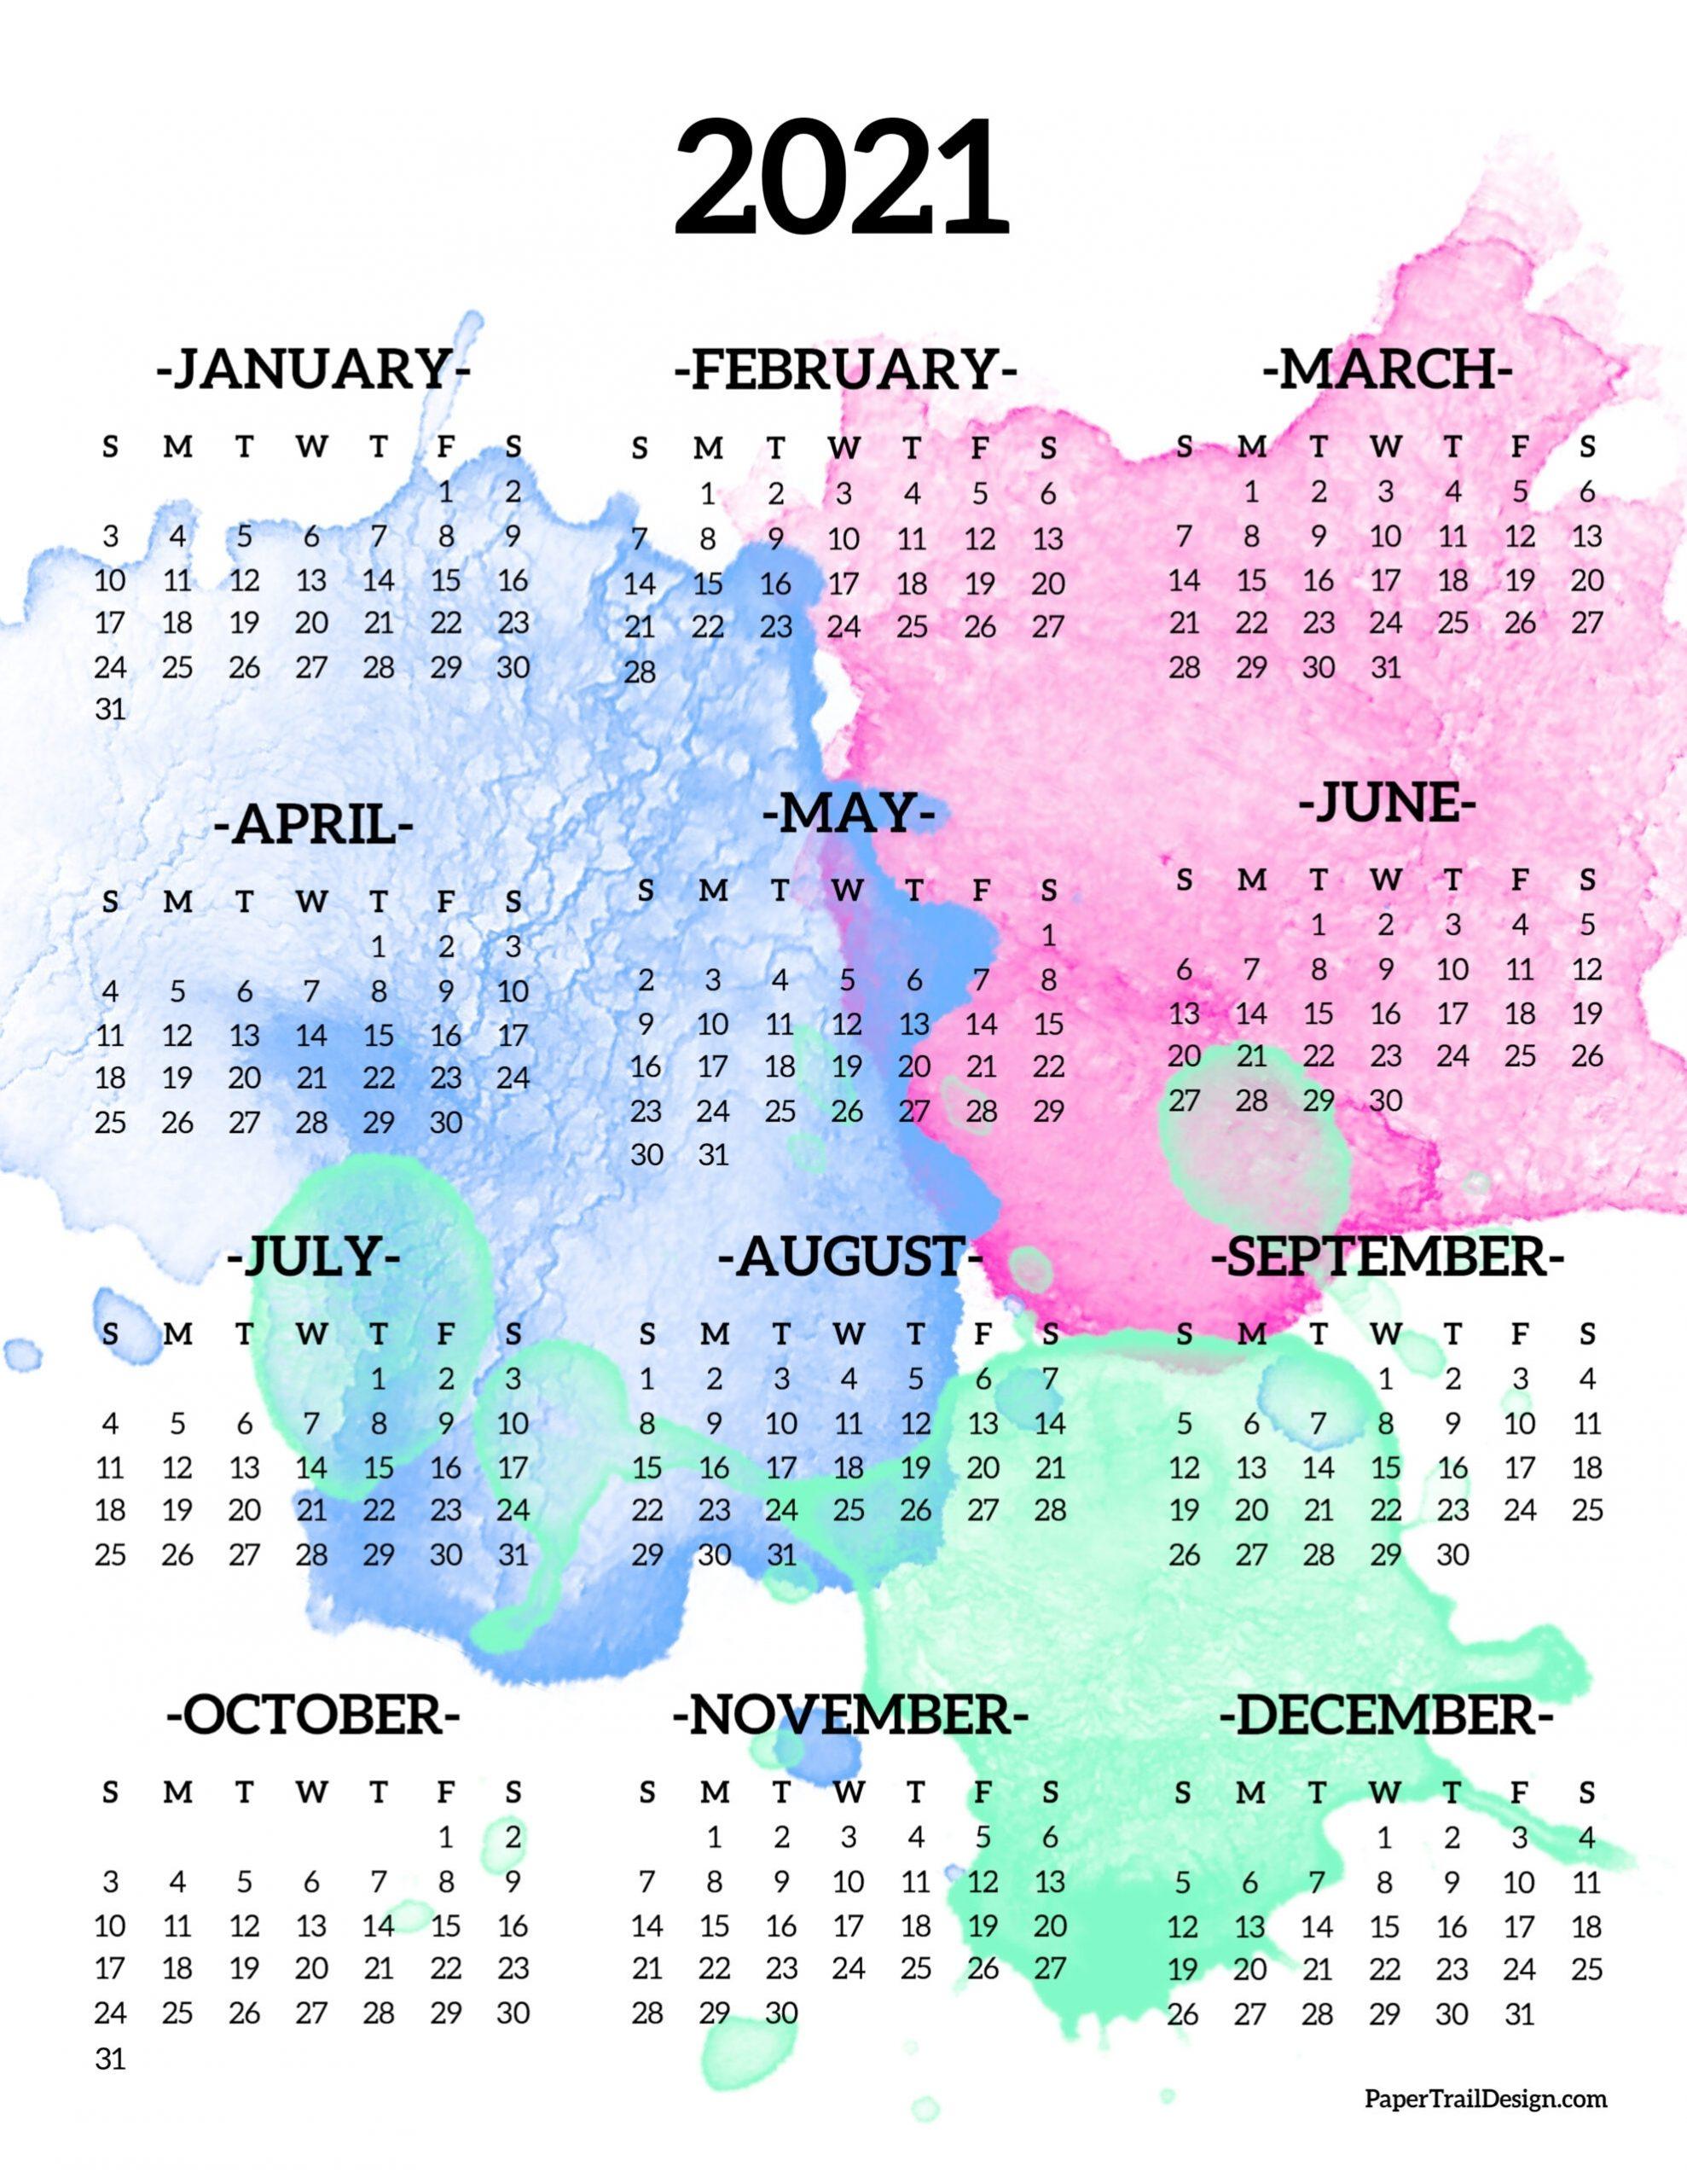 2021 Calendar Year At A Glance Printable | Best Calendar ...